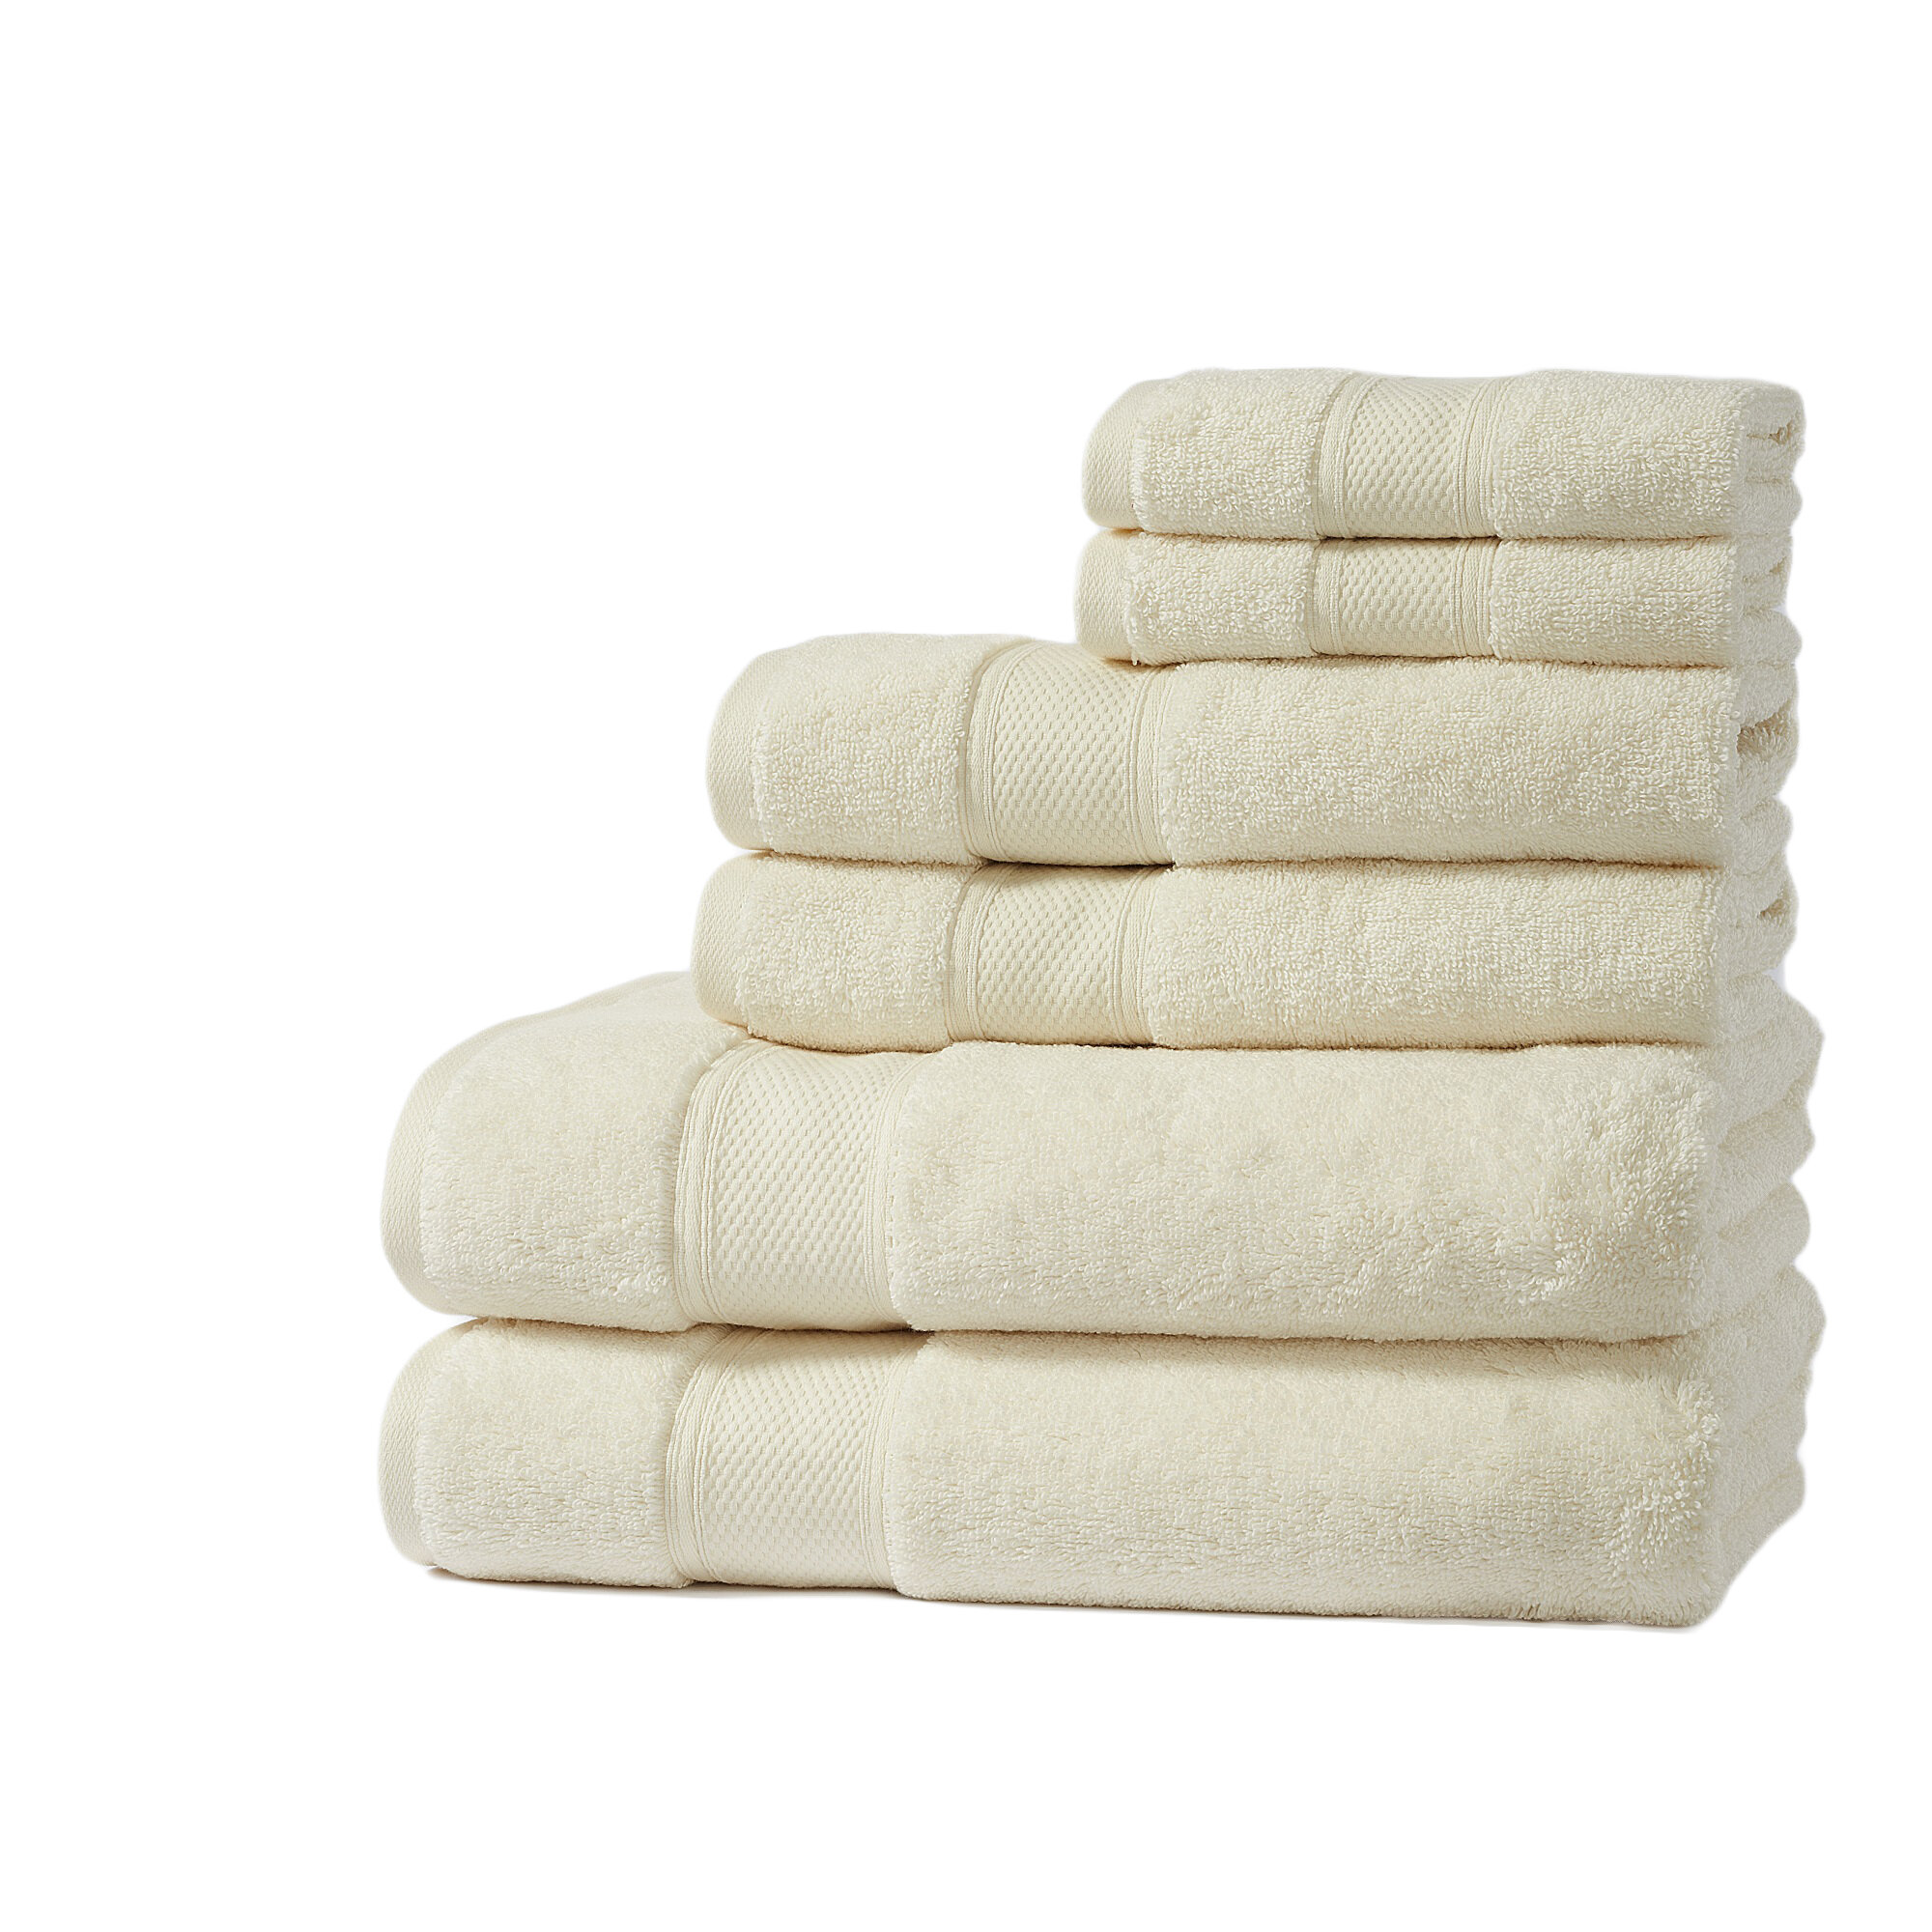 Home Fashion Designs Santorini Luxury 6 Piece Turkish Cotton Towel